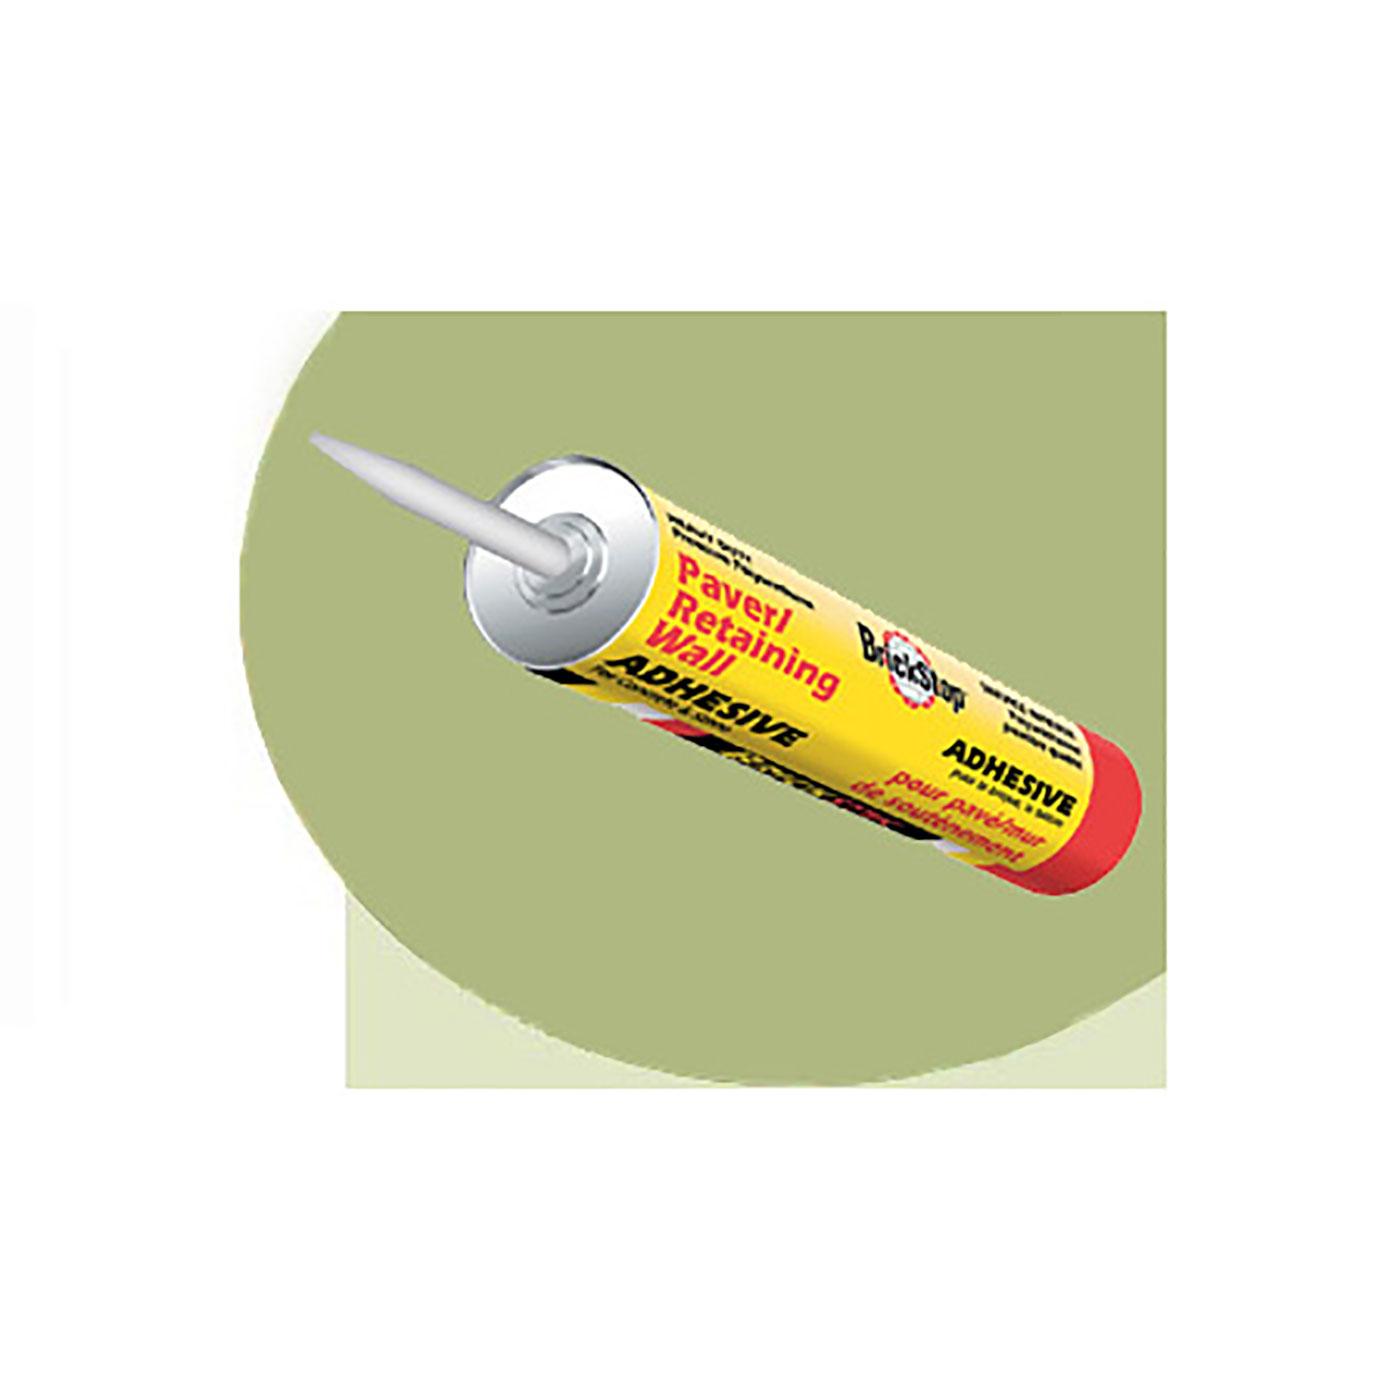 10 oz. BrickStik Premium Polyurethane Paver/Retaining Wall Adhesive